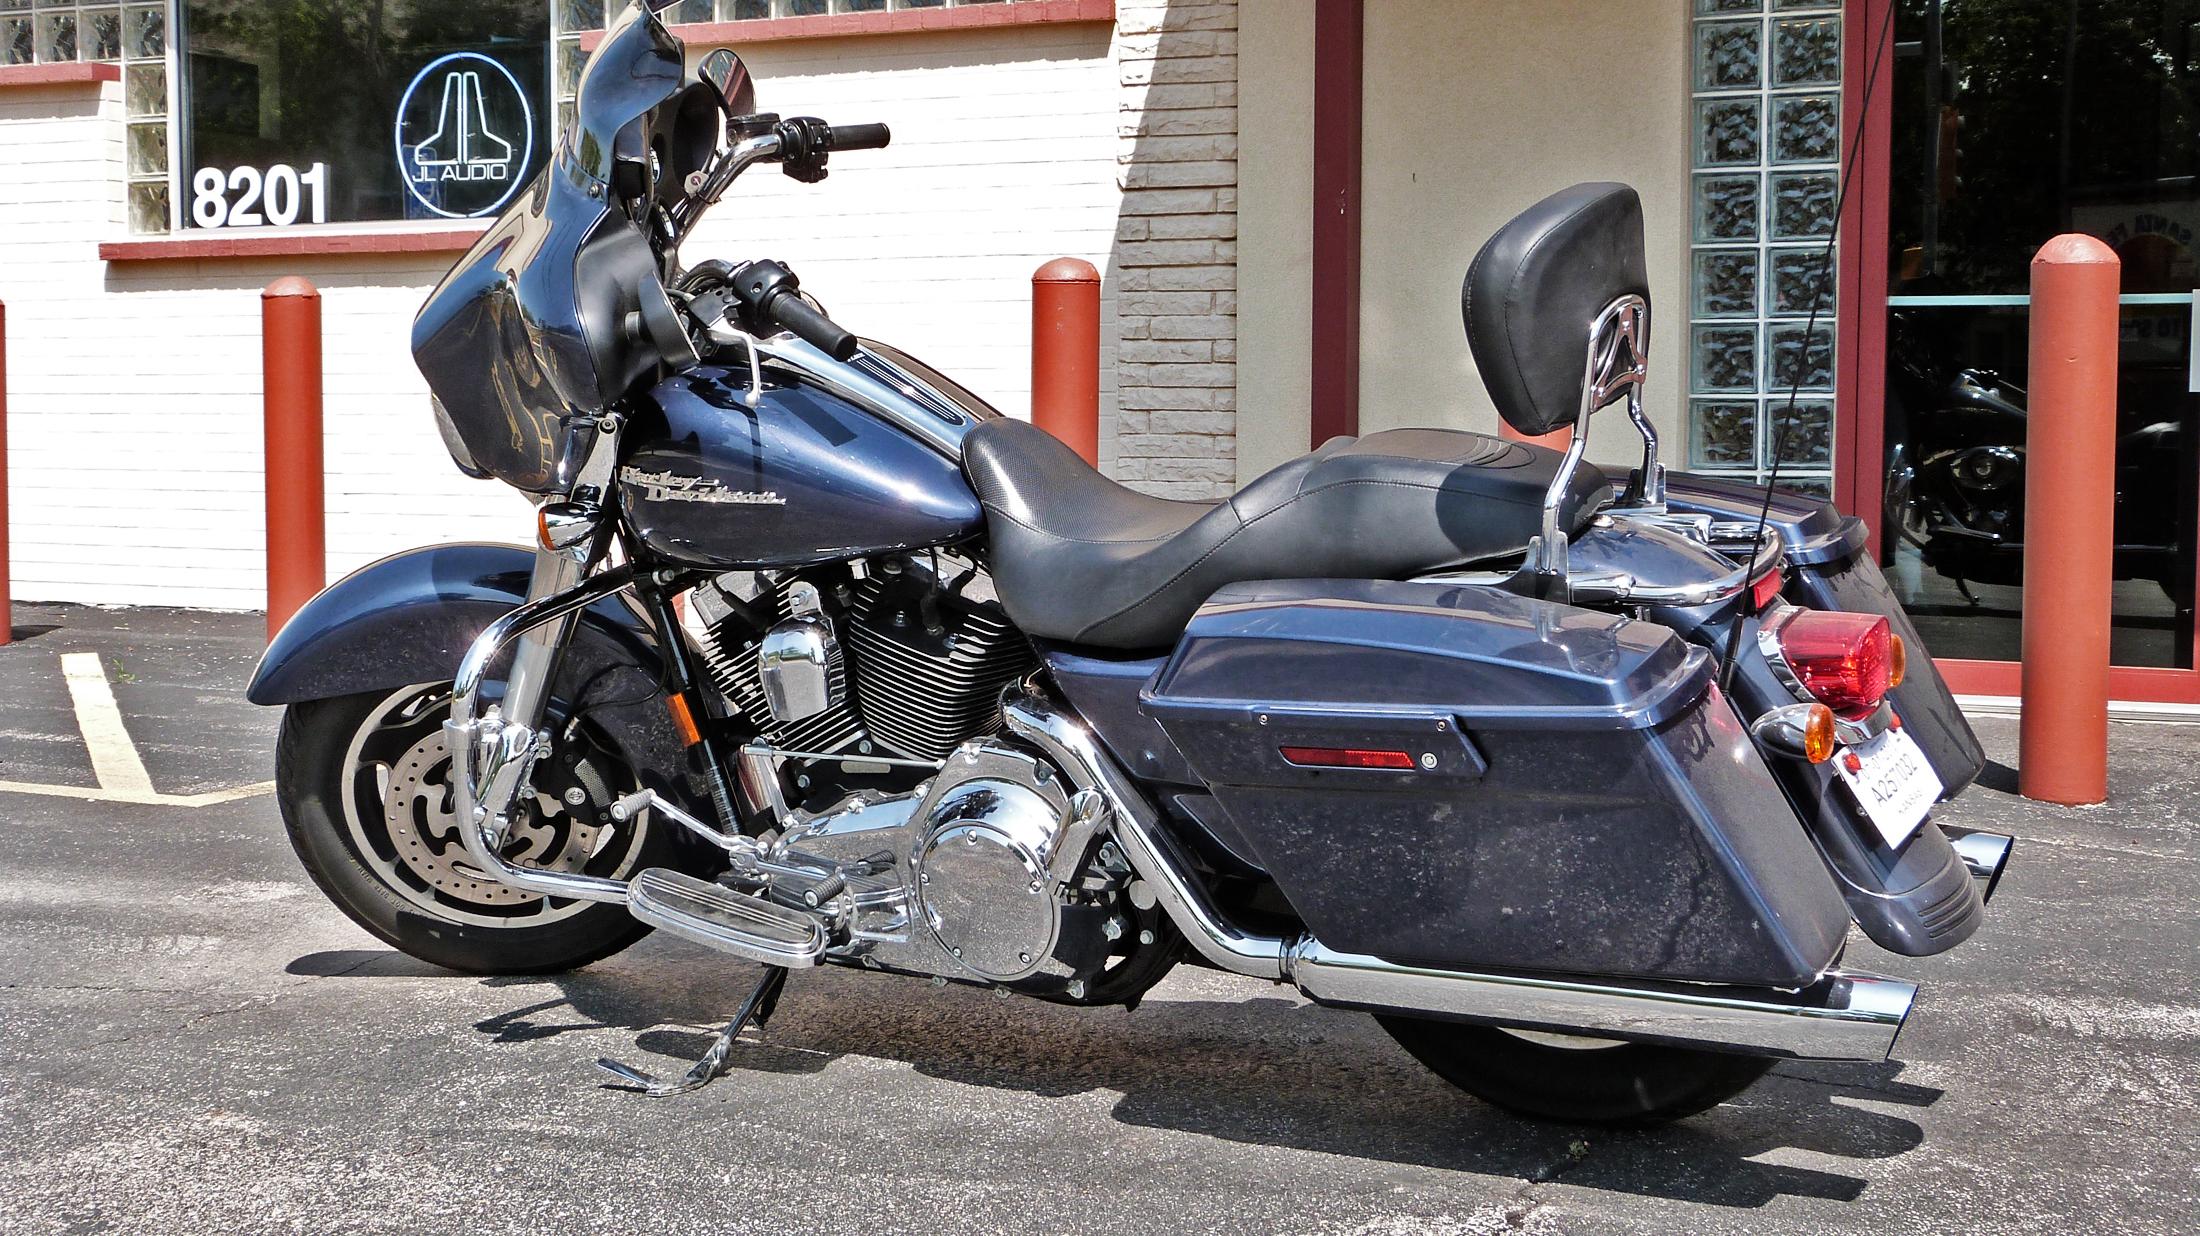 Harley Davidson Electra Glide Santa Fe Auto Sound